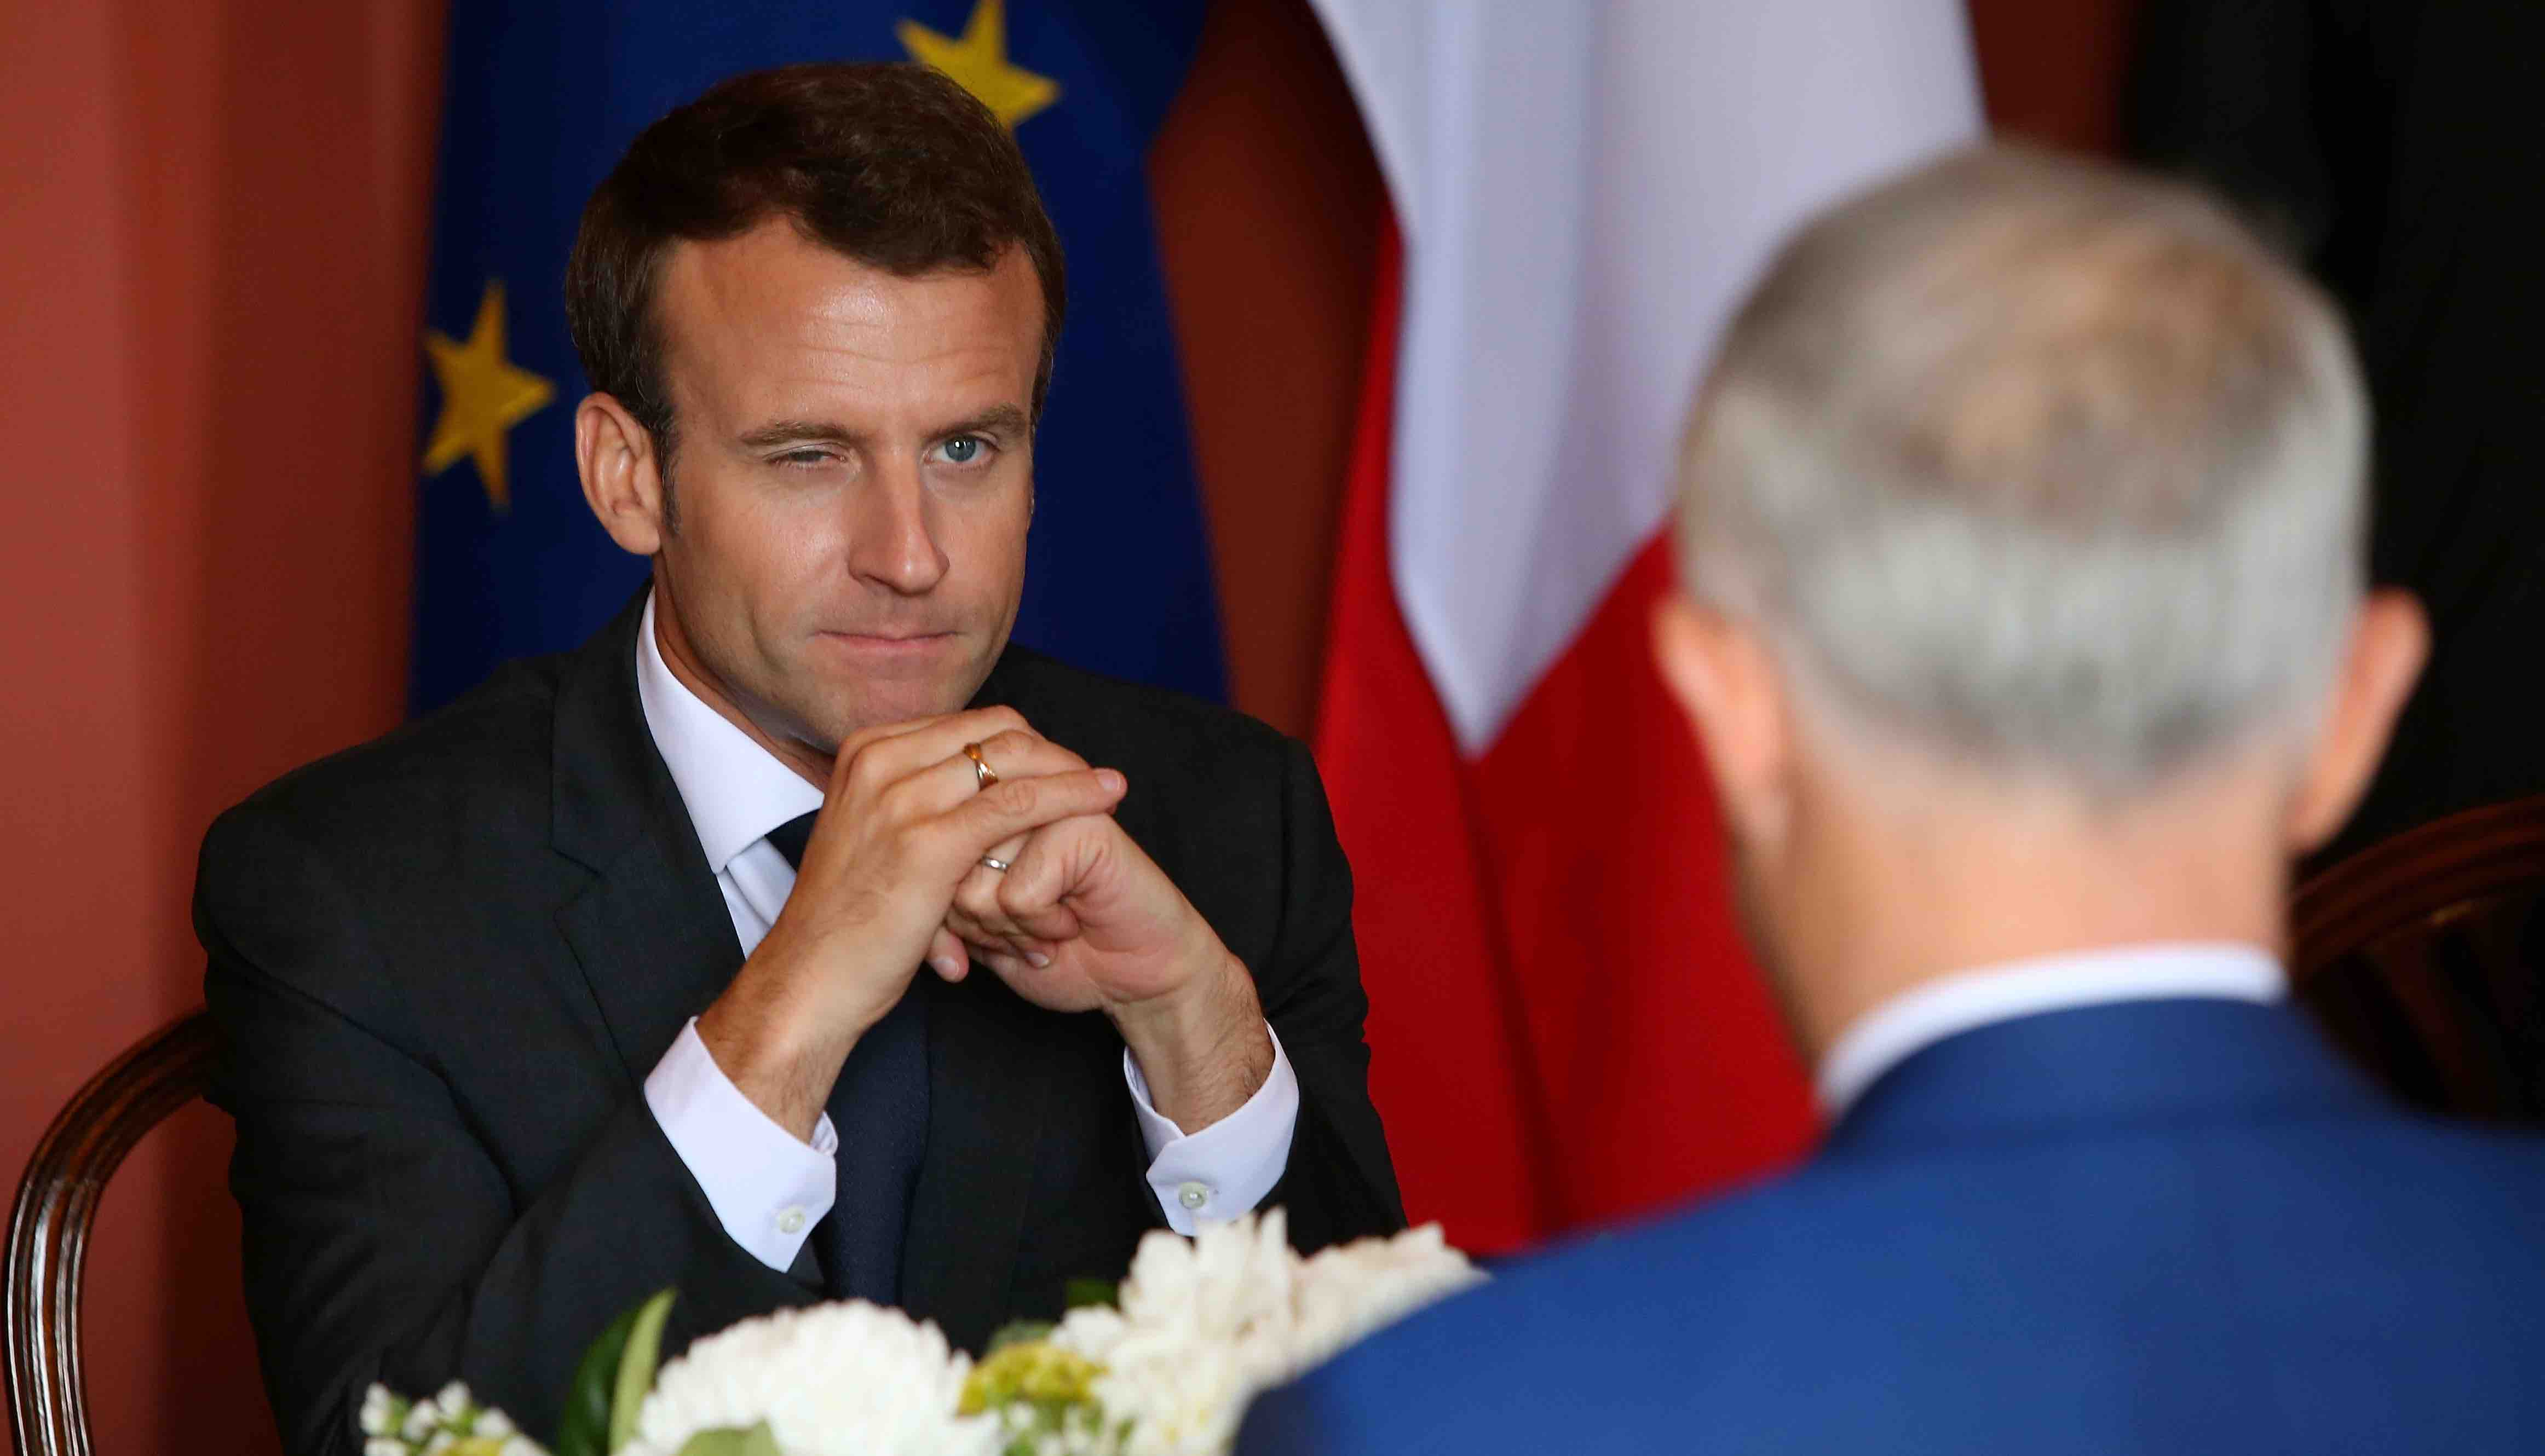 French President Emmanuel Macron speaks with Australia's Malcolm Turnbull on 2 May in Sydney (Photo: Jason McCawley via Getty)